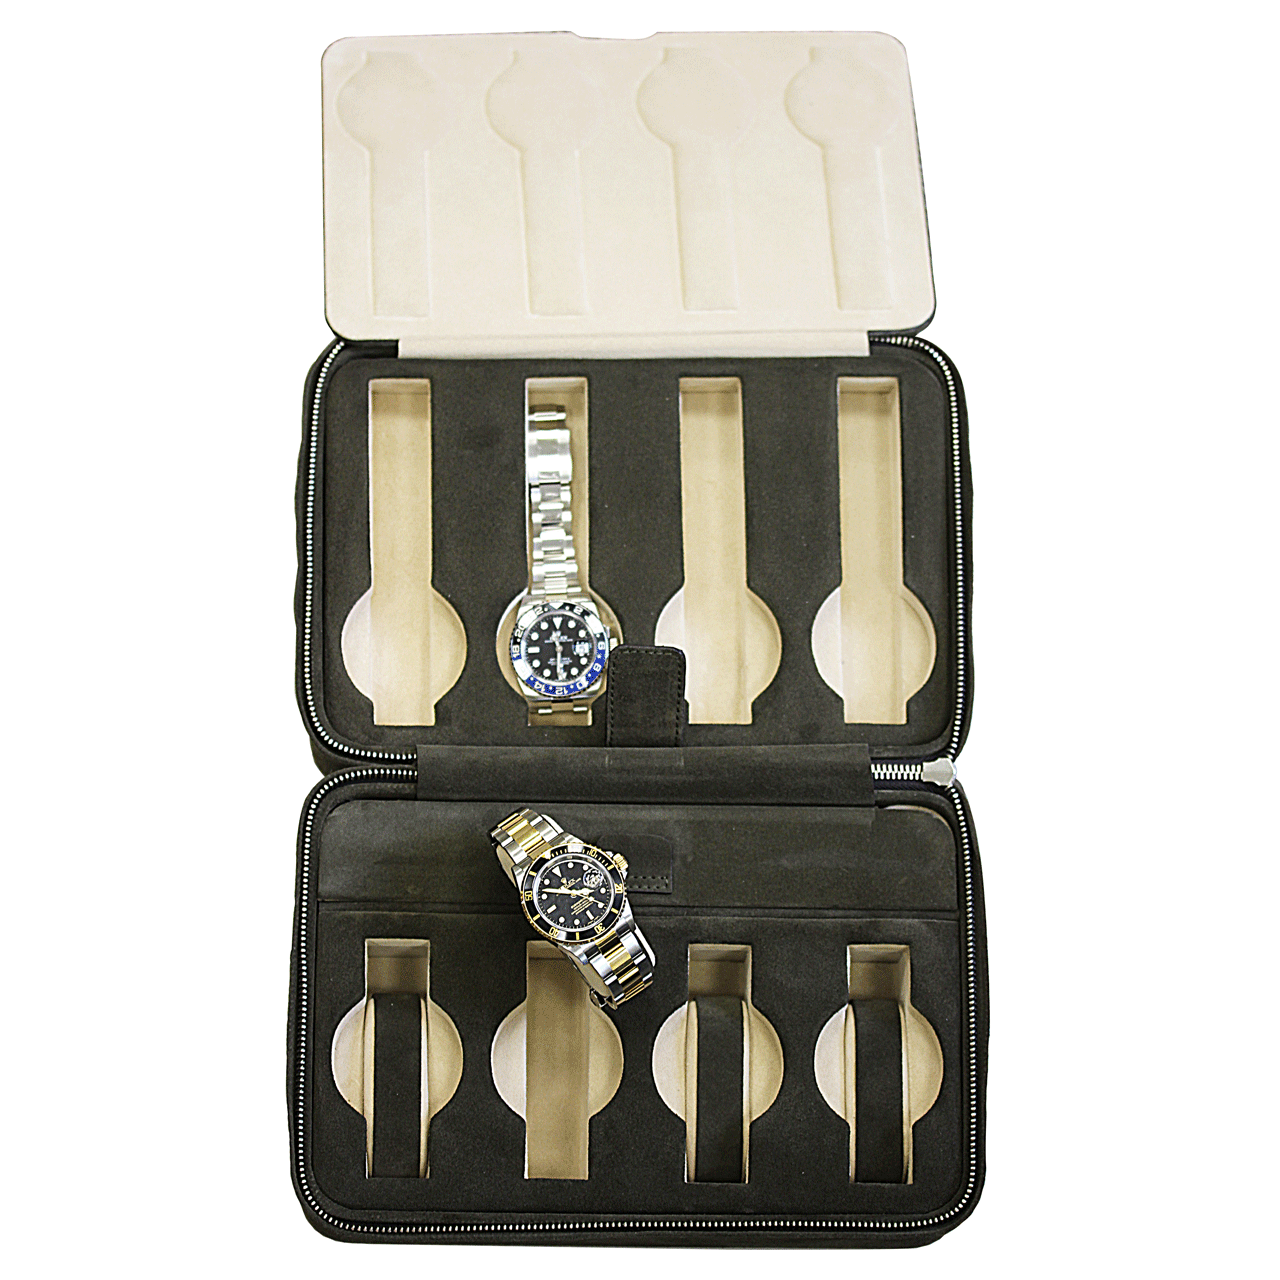 Hamilton Italian Leather Case For Eight Watches